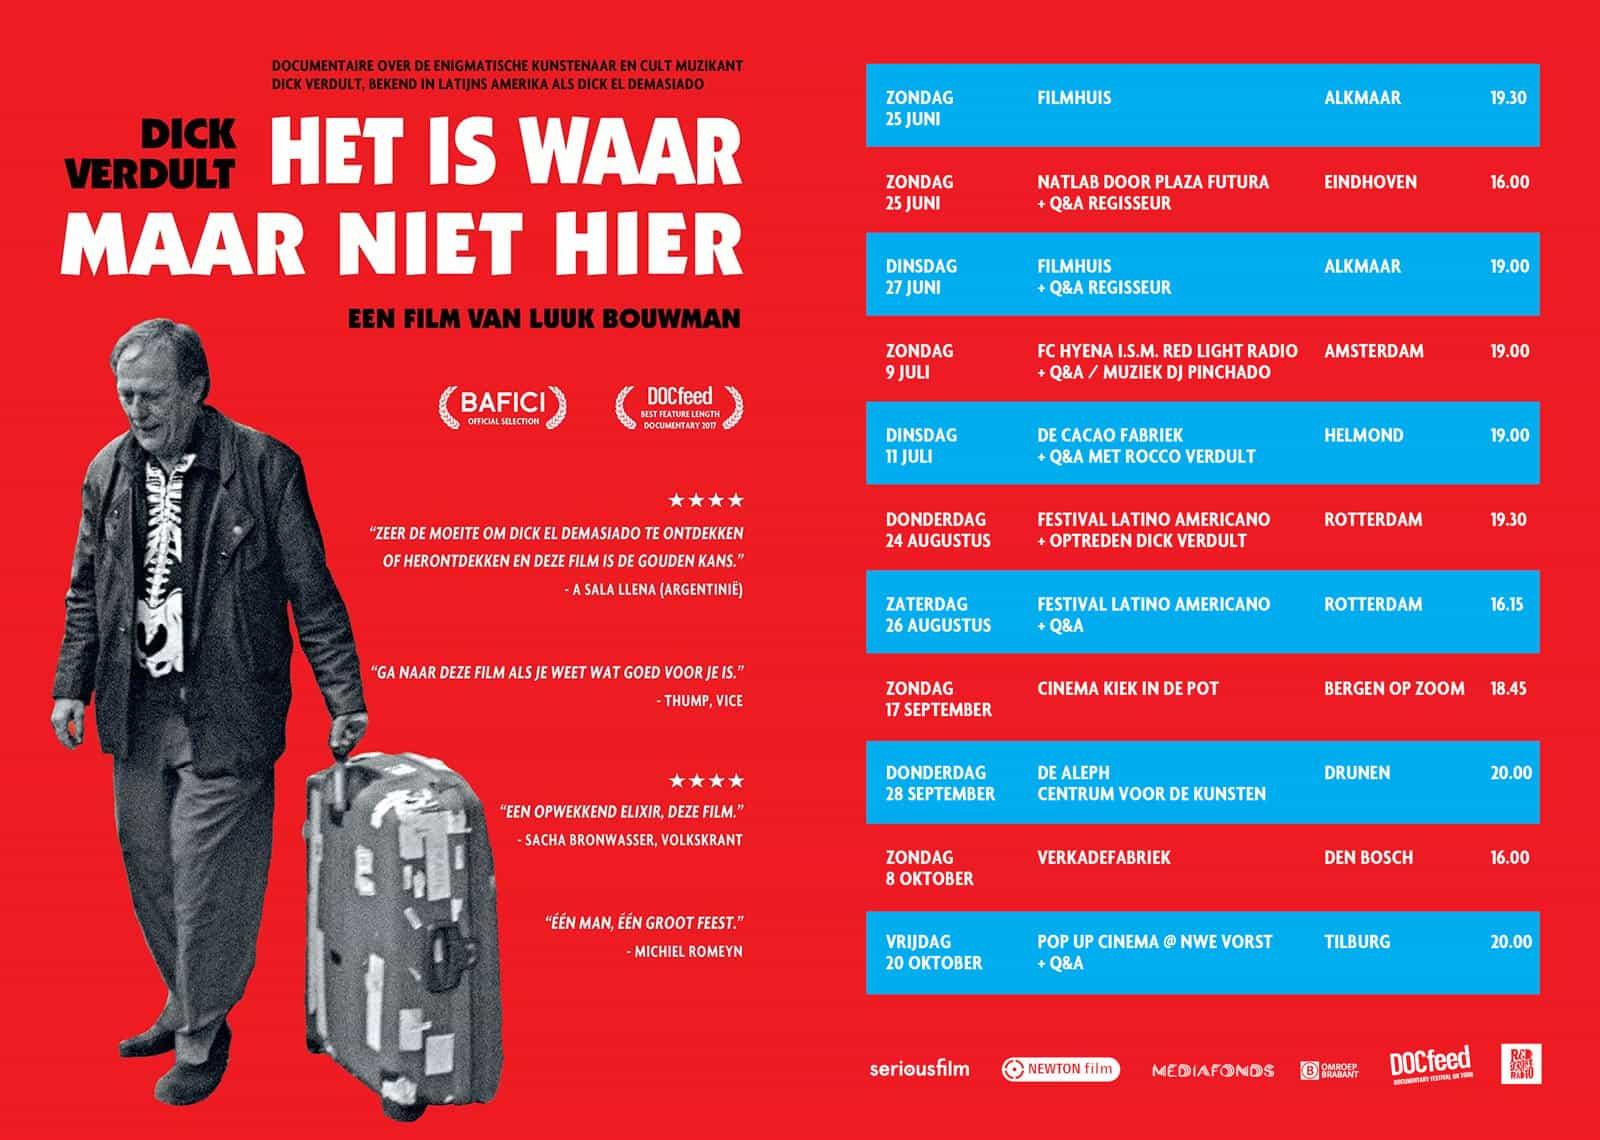 Film Vertoningen-in-Nederland